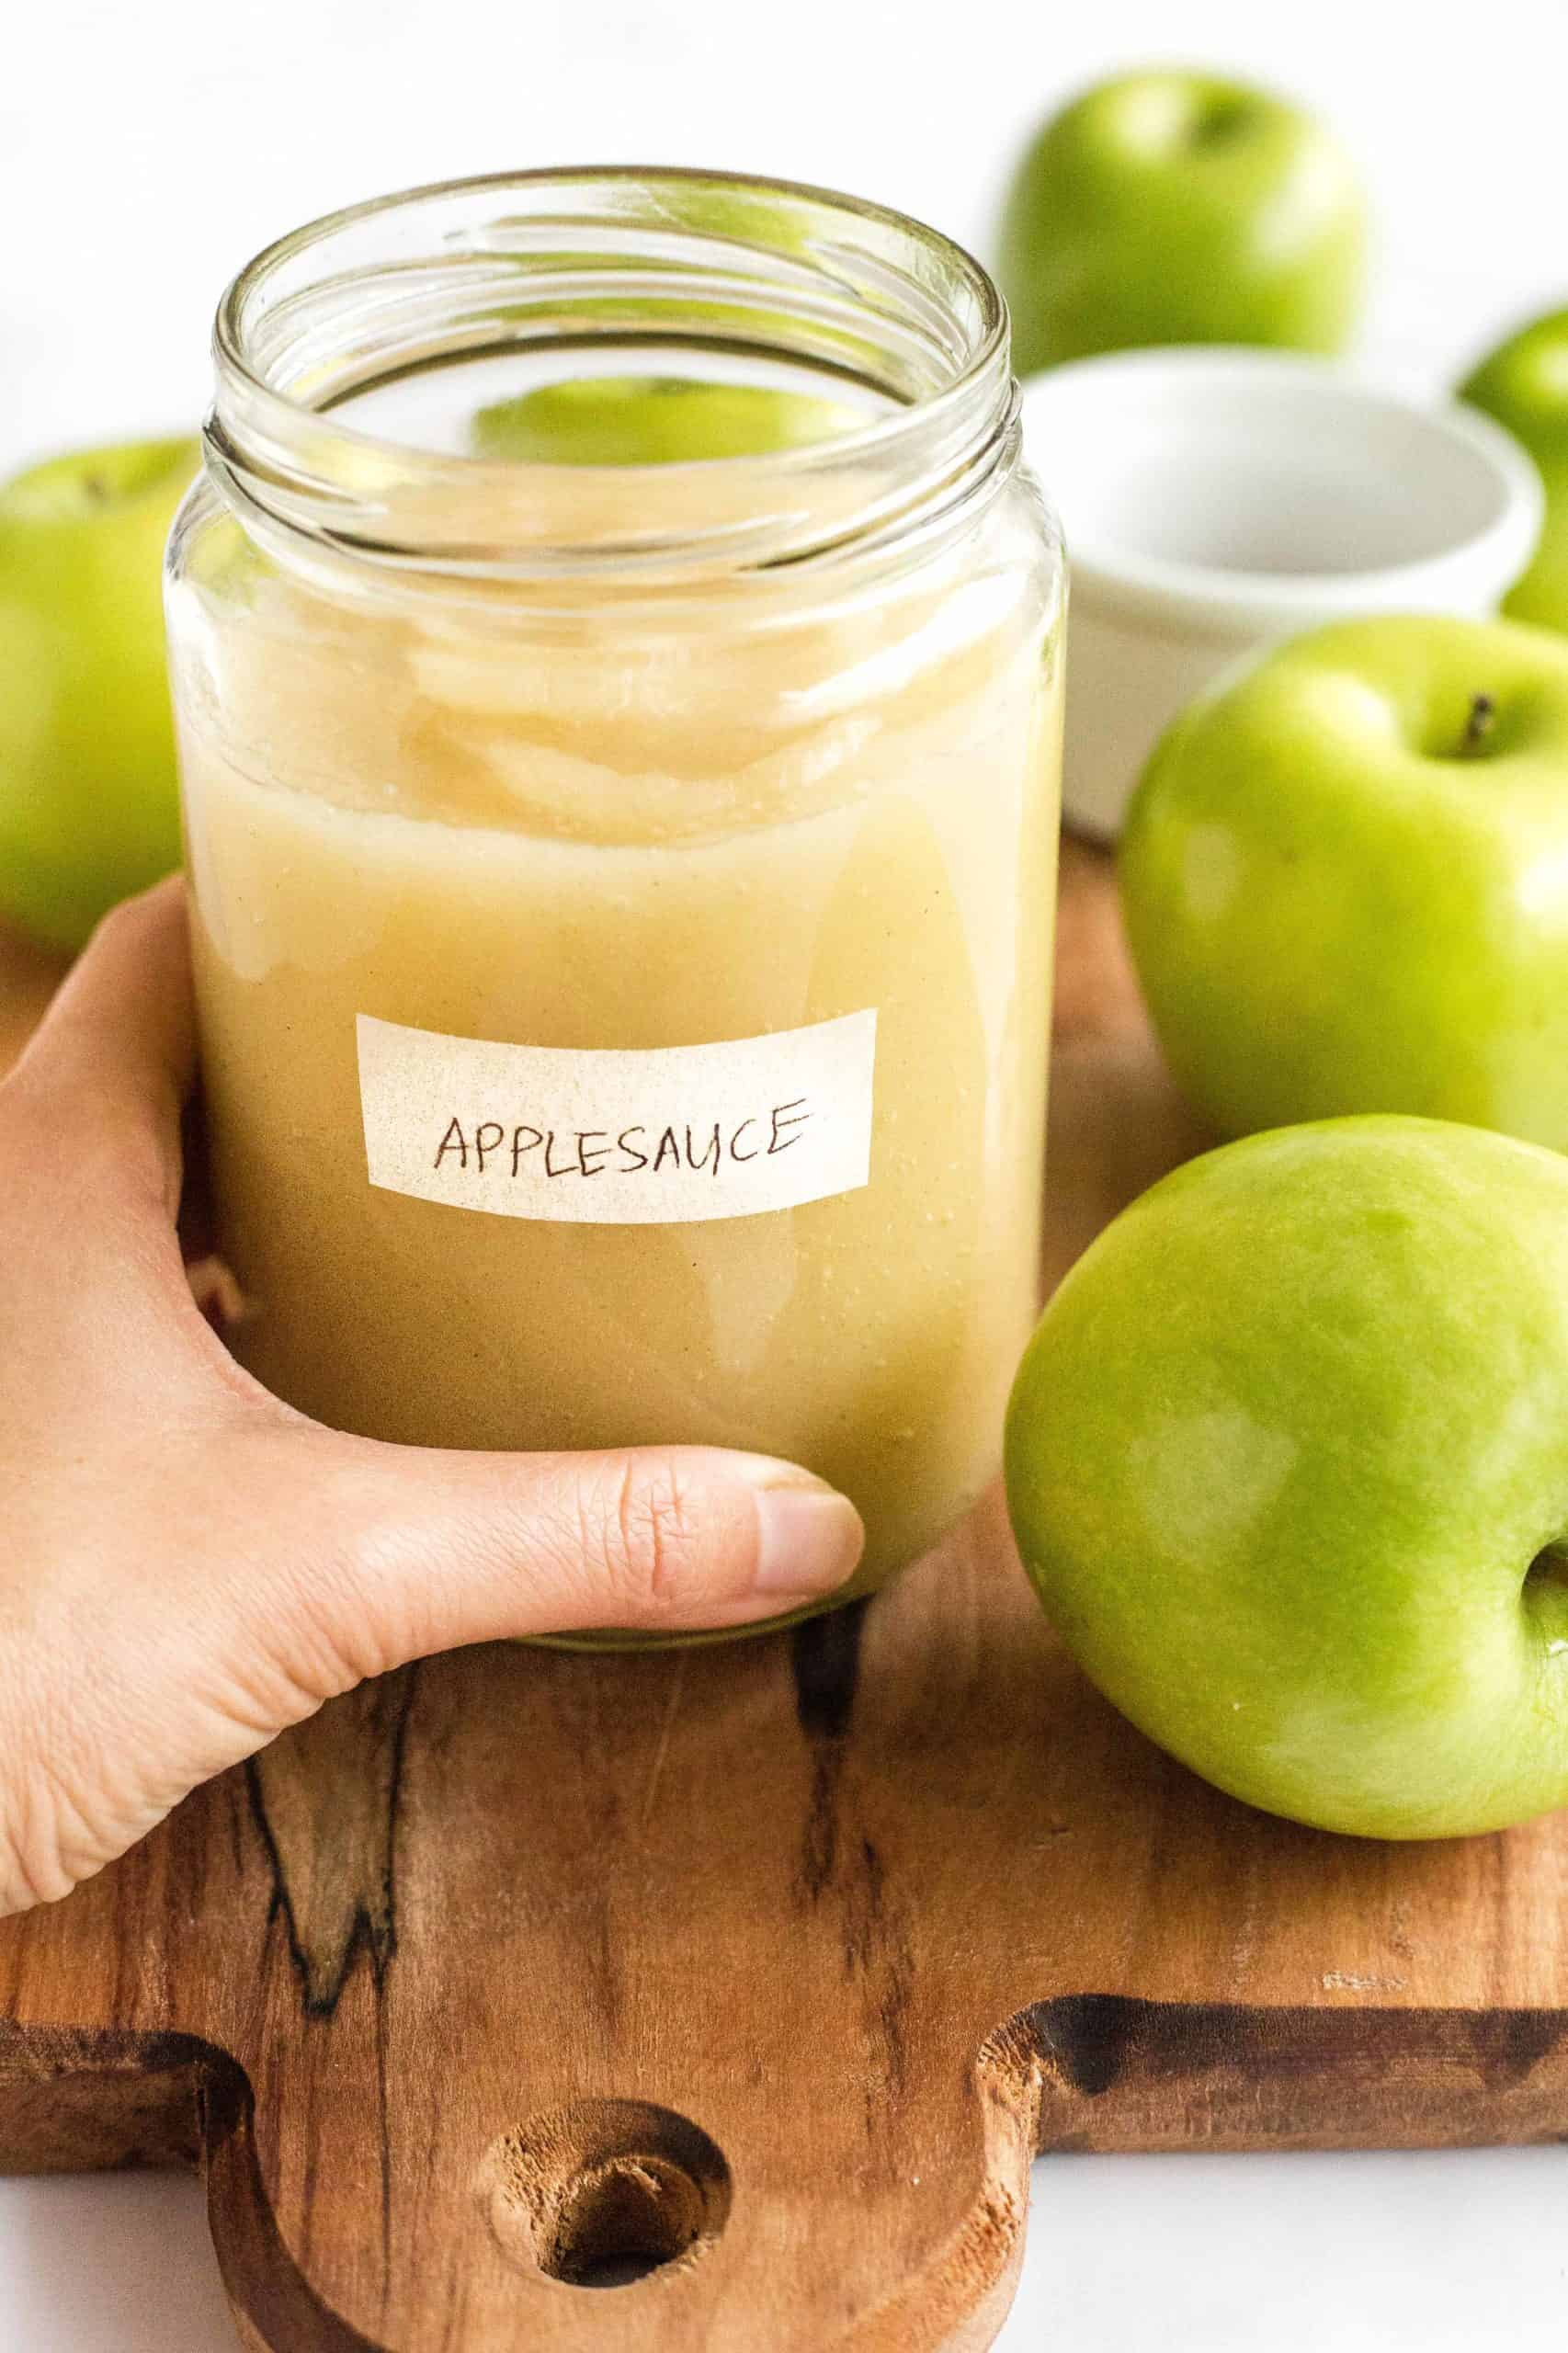 Hand holding a jar for fresh homemade applesauce.